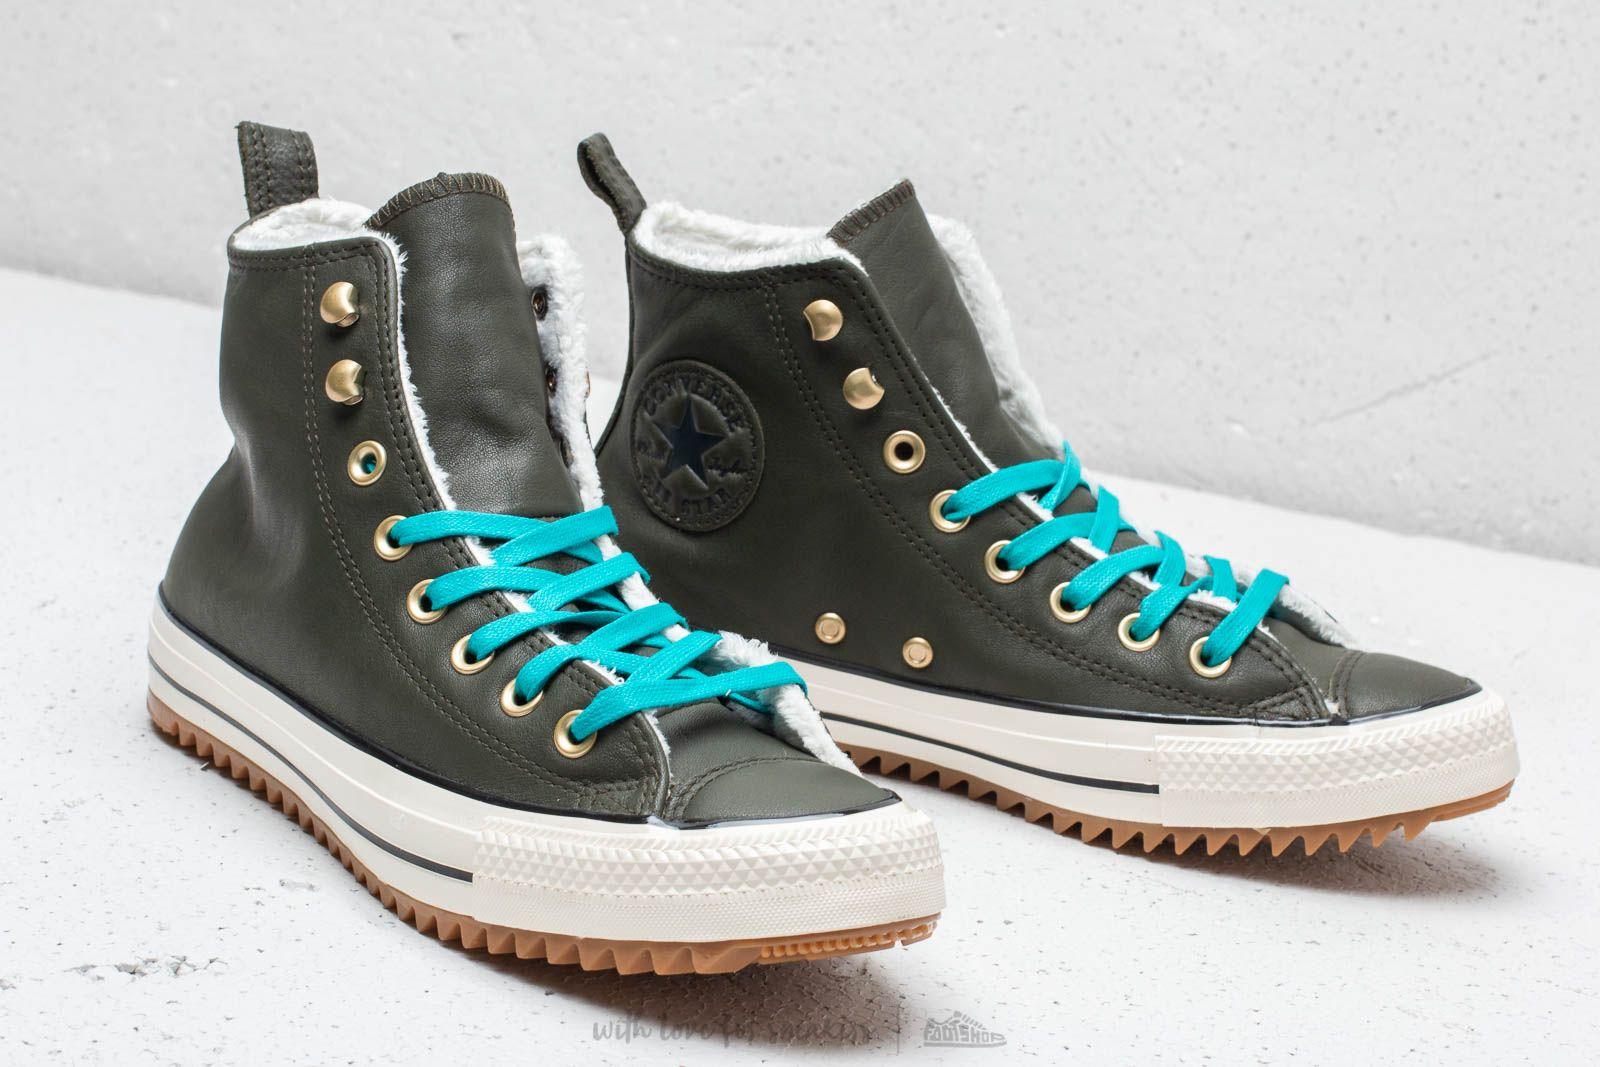 Converse Chuck Taylor All Stars Hiker Boot High Utility Green  Rapid Teal  za skvělou cenu 117ae5a162